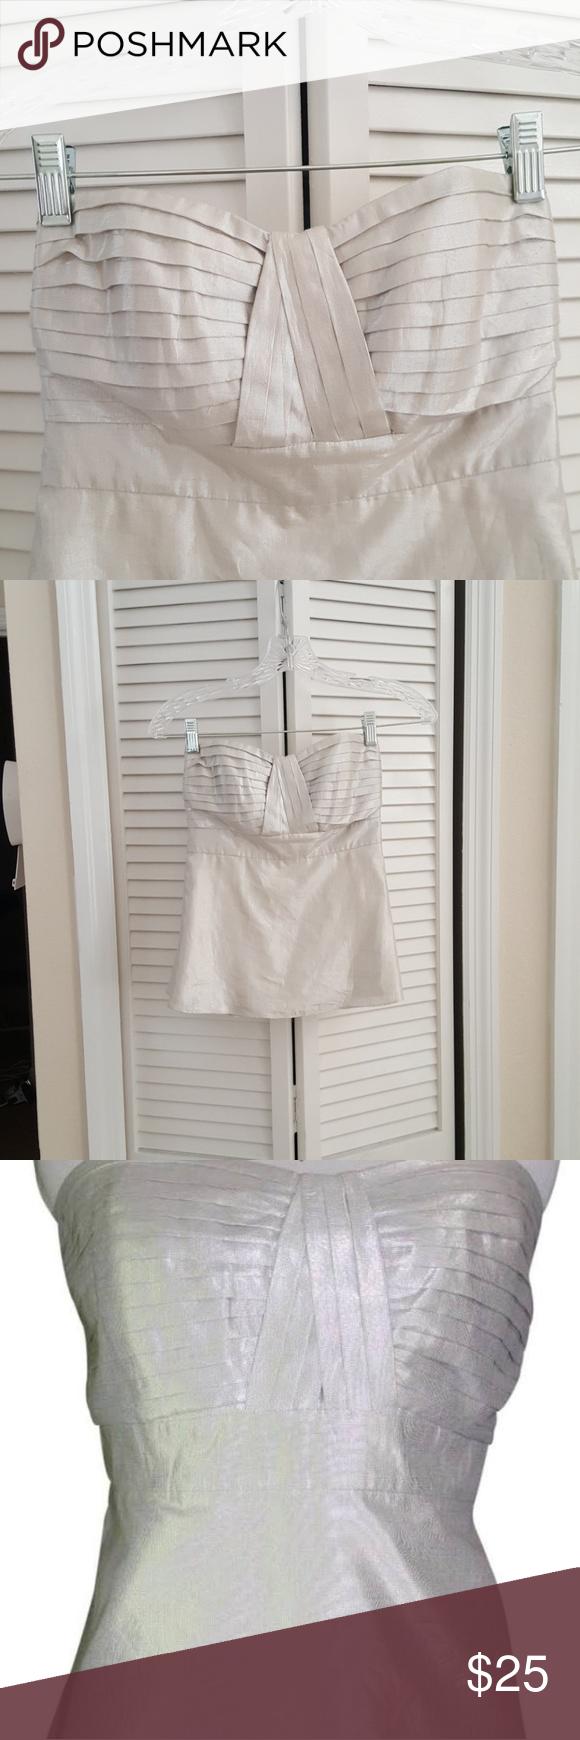 6950ffbfdb6 Selling this Strapless corset top